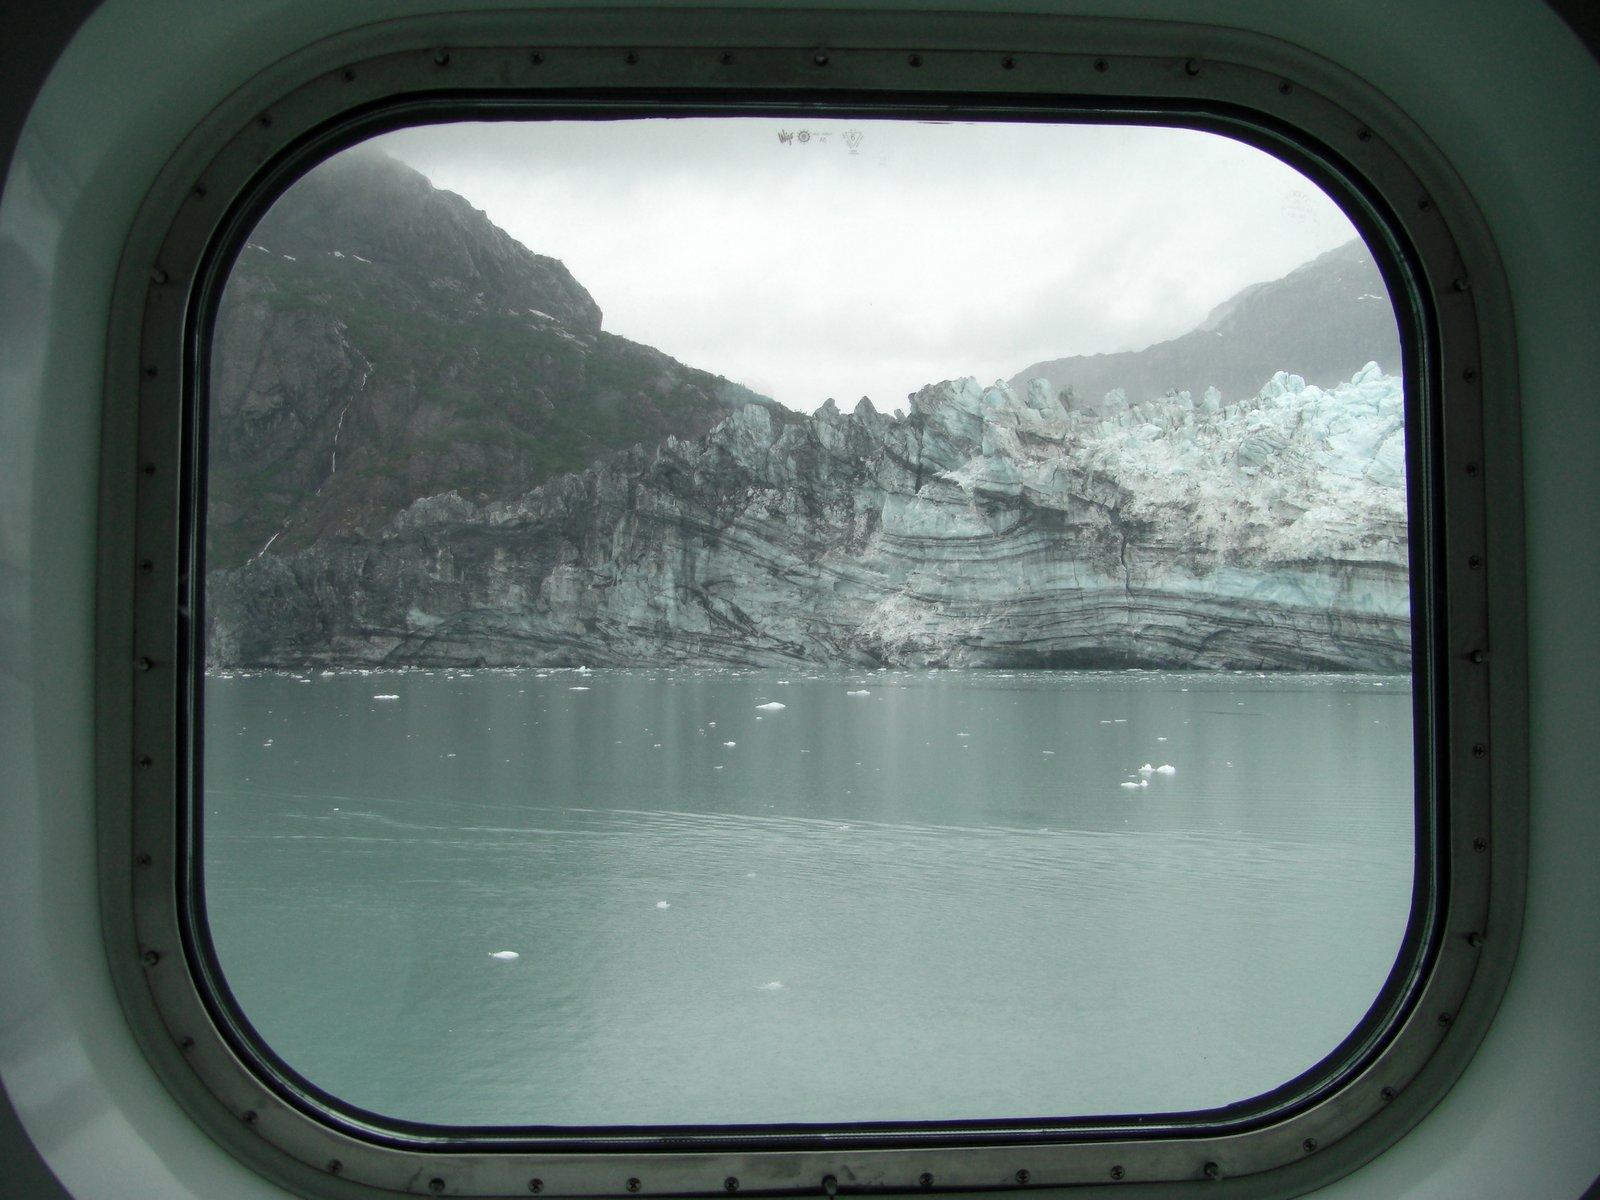 The glacier outside the window